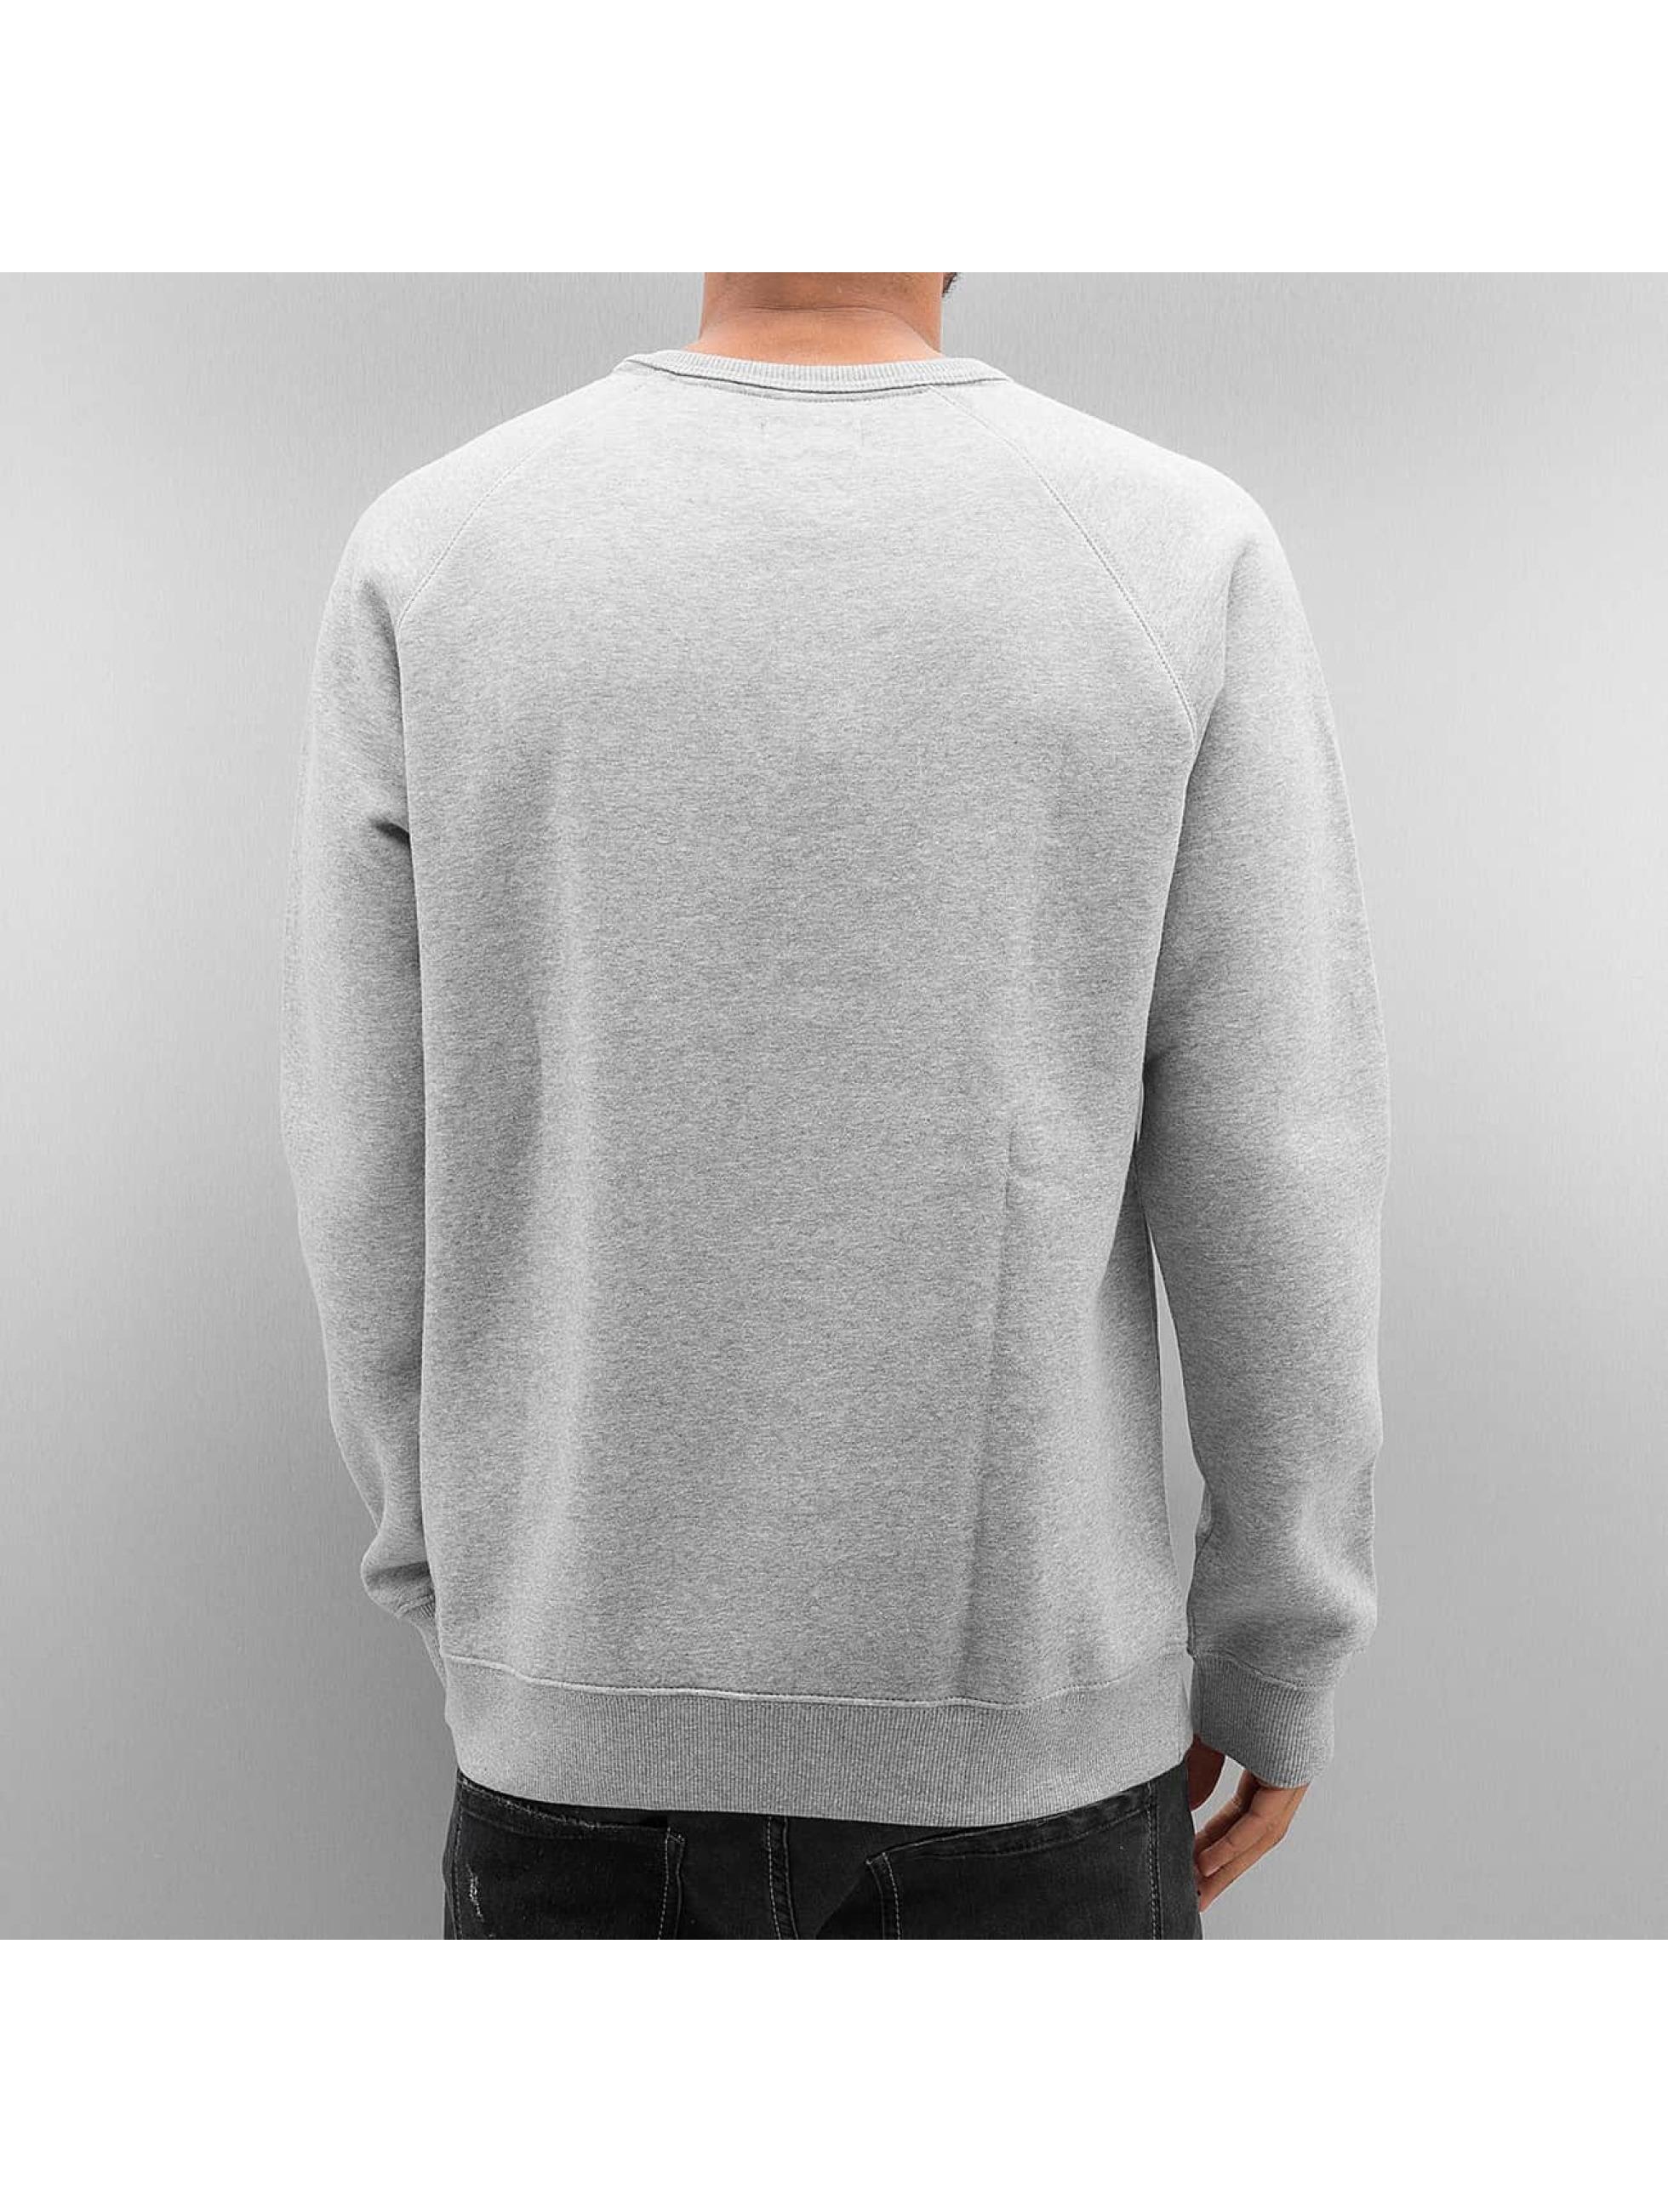 adidas Jumper Trefoil Fleece grey